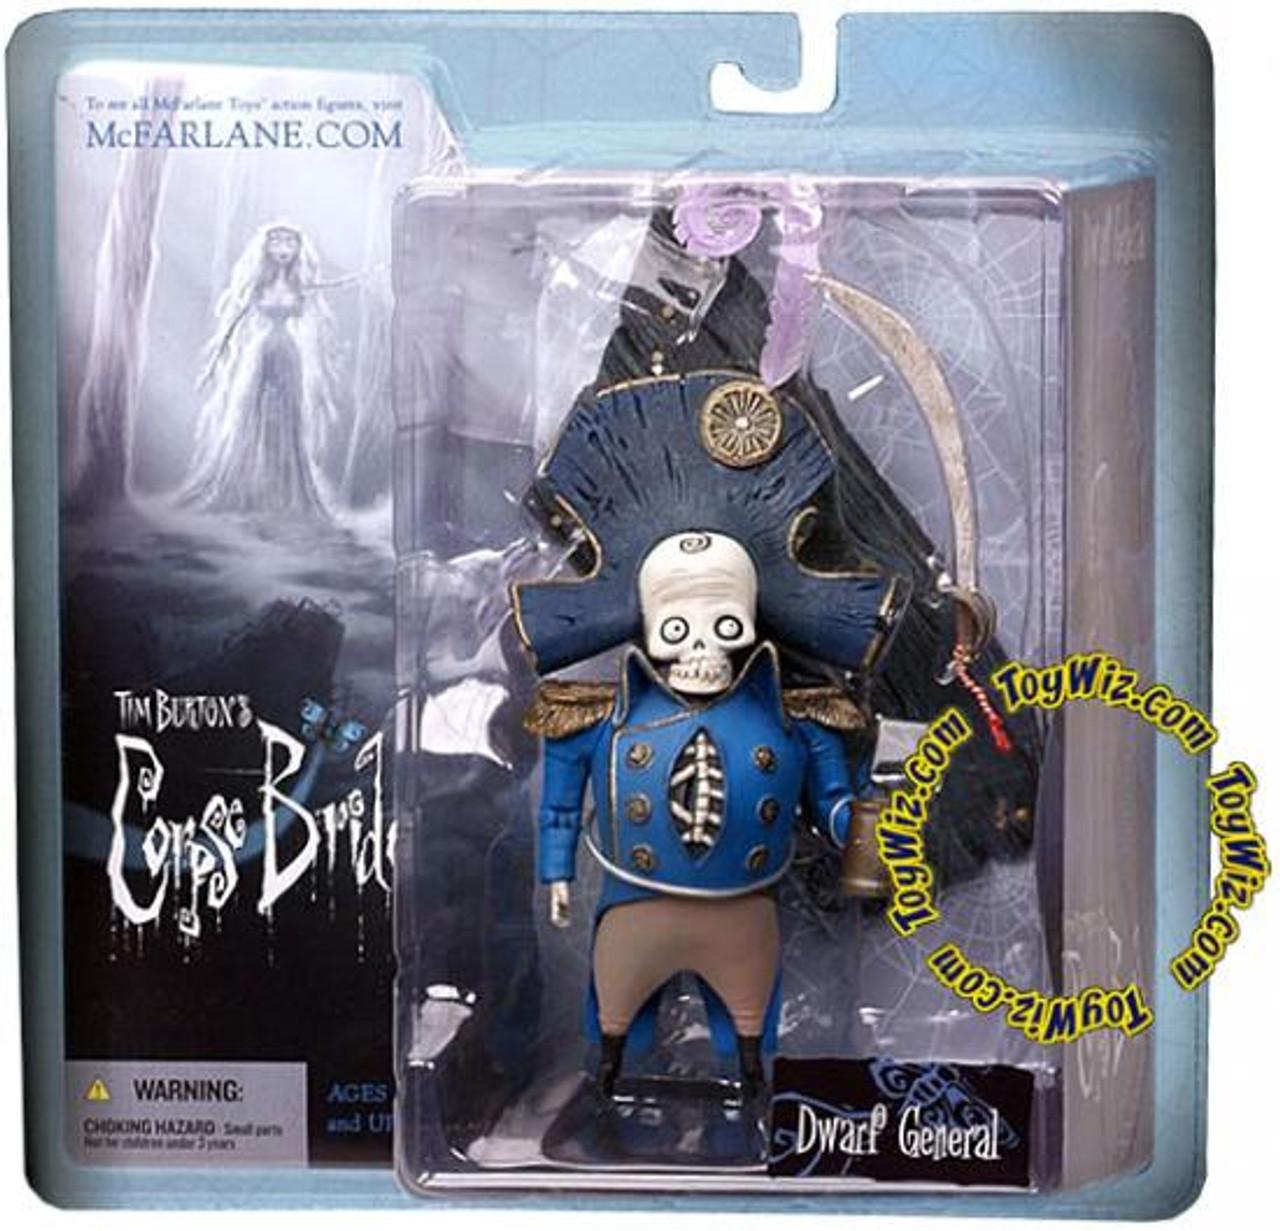 McFarlane Toys Corpse Bride Series 1 Dwarf General Bonesapart Action Figure